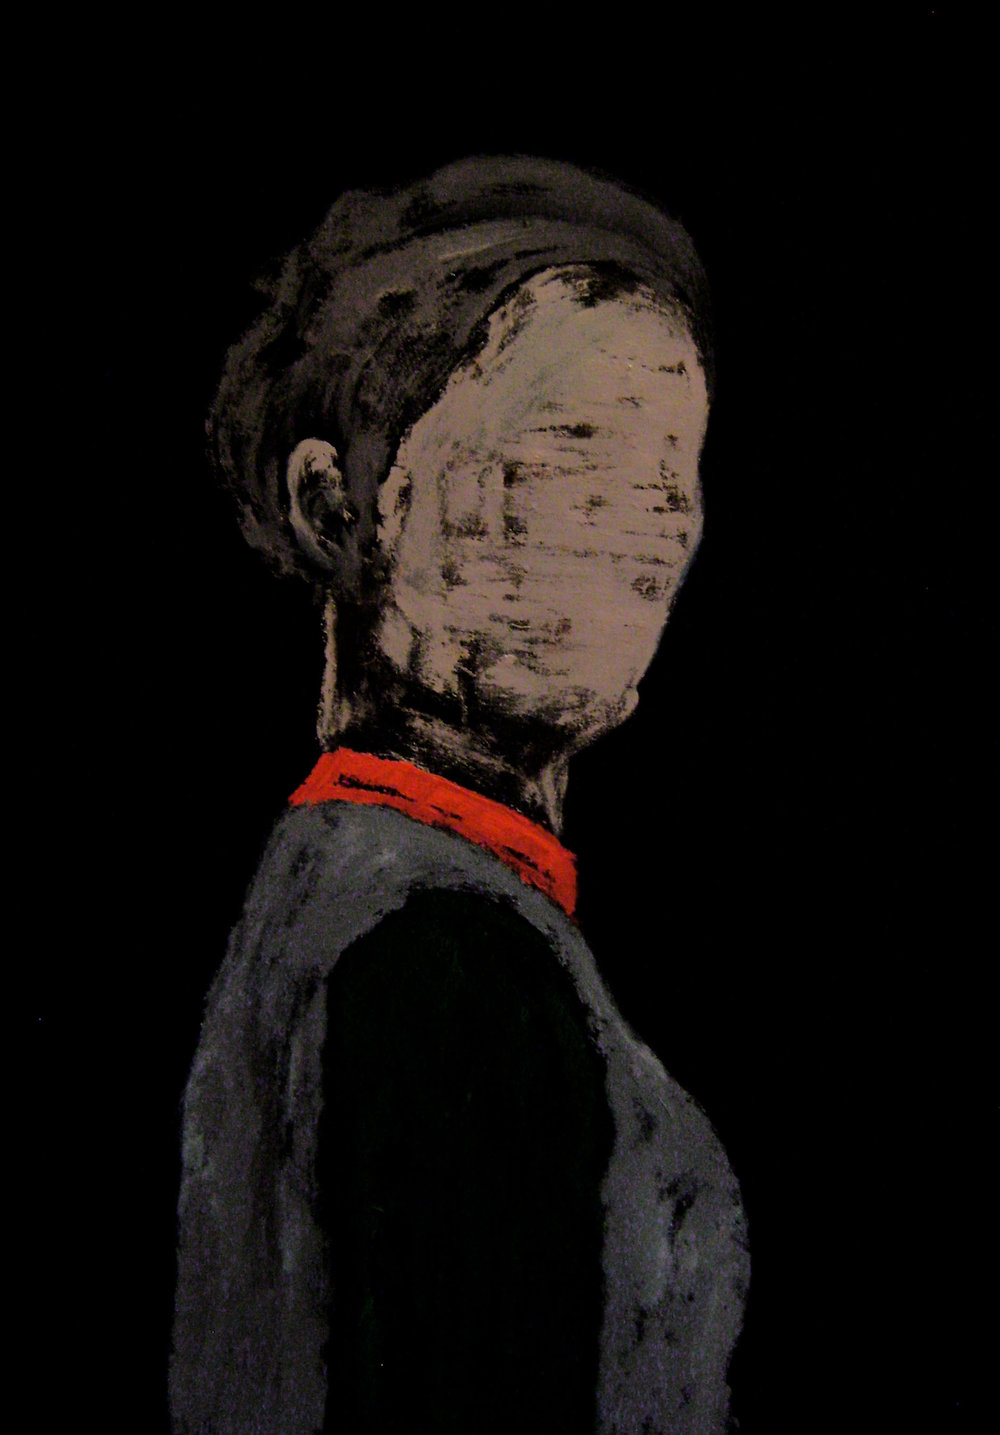 Alienation: Wedad Alnasser